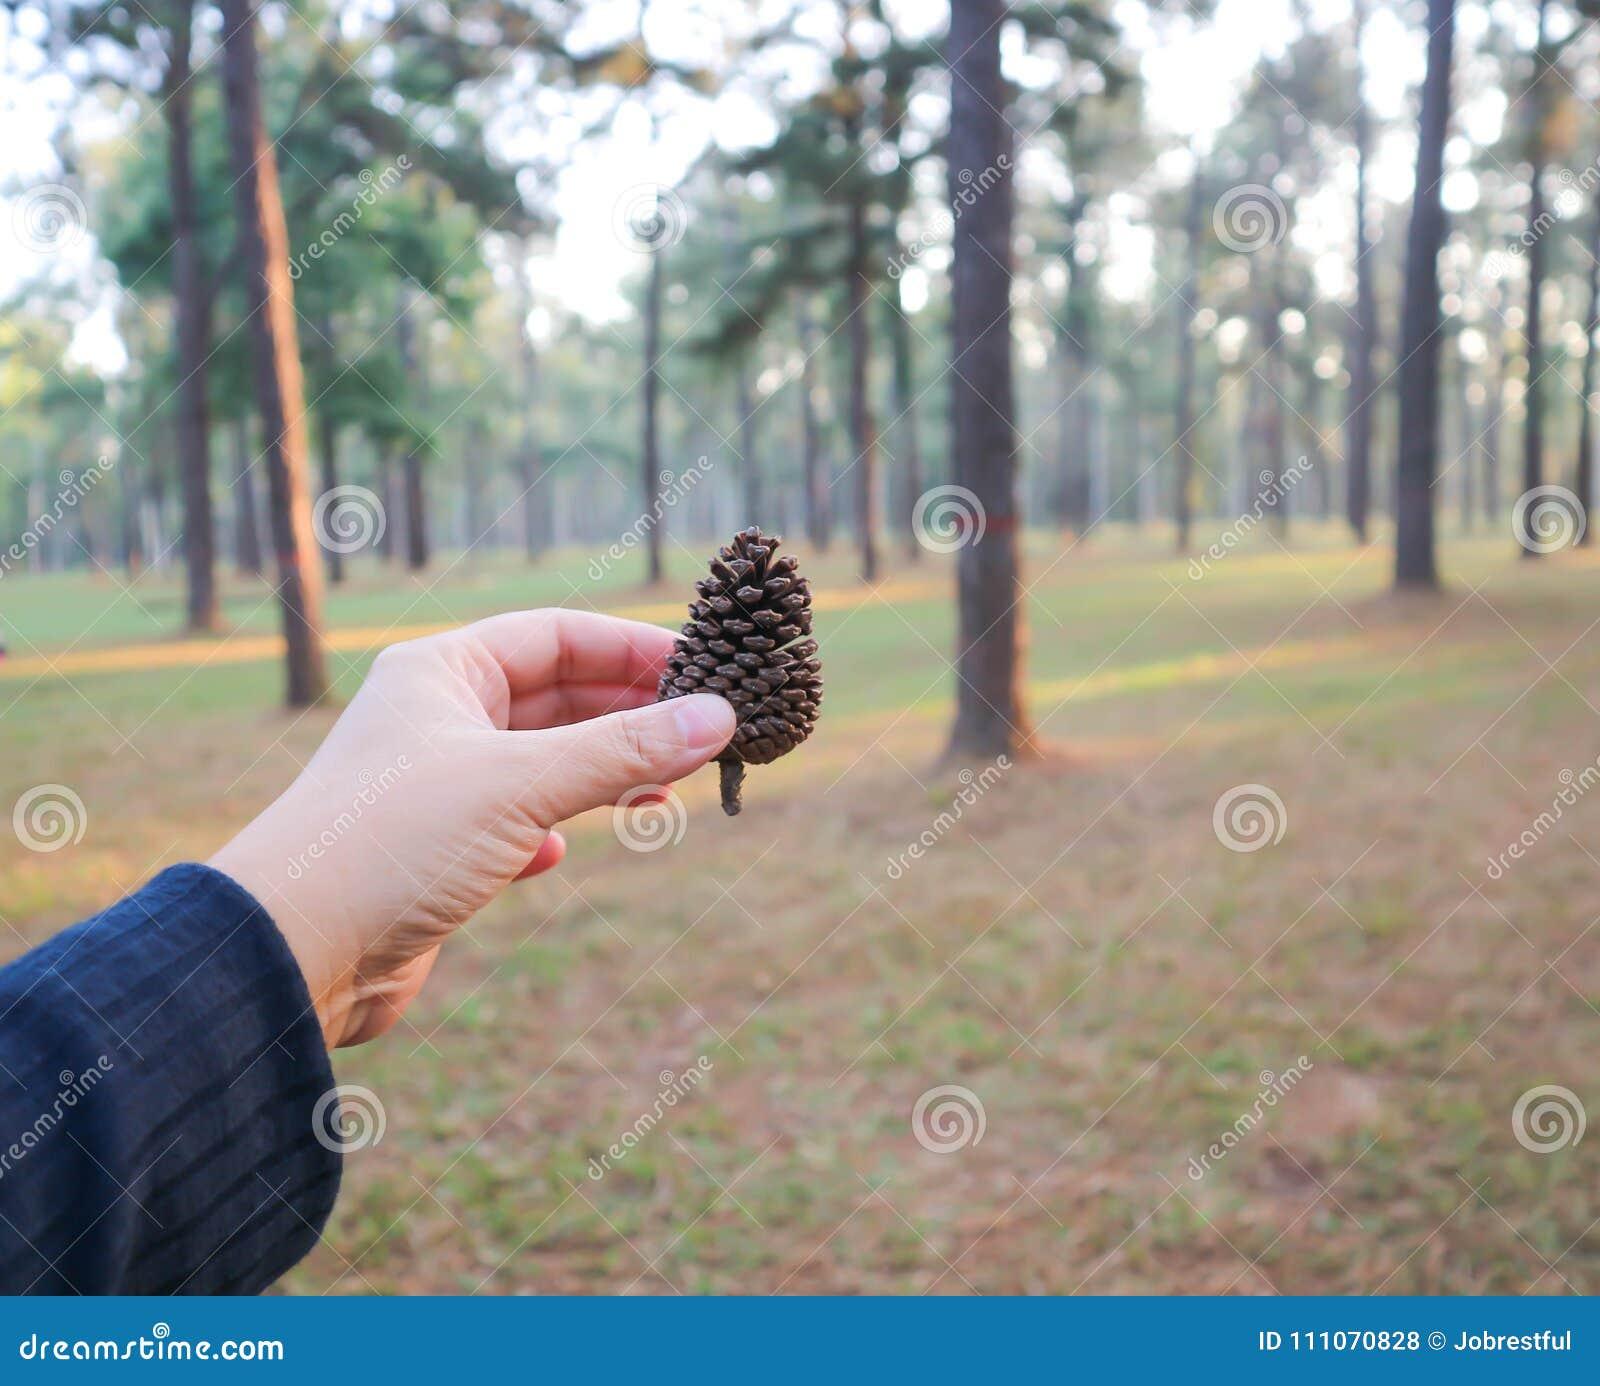 Kiefernblume oder starb Kiefernblume